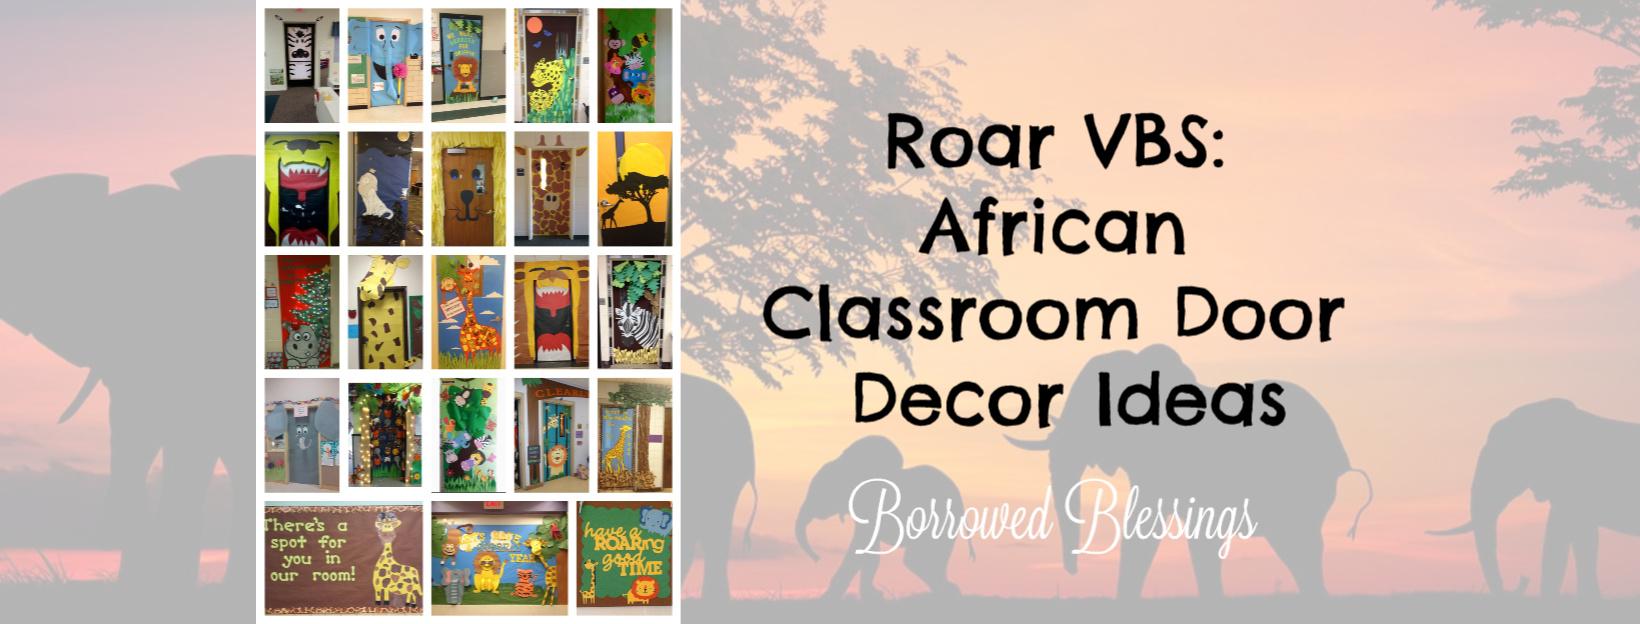 Roar Vbs African Classroom Door Decor Ideas Borrowed Blessingsborrowed Blessings